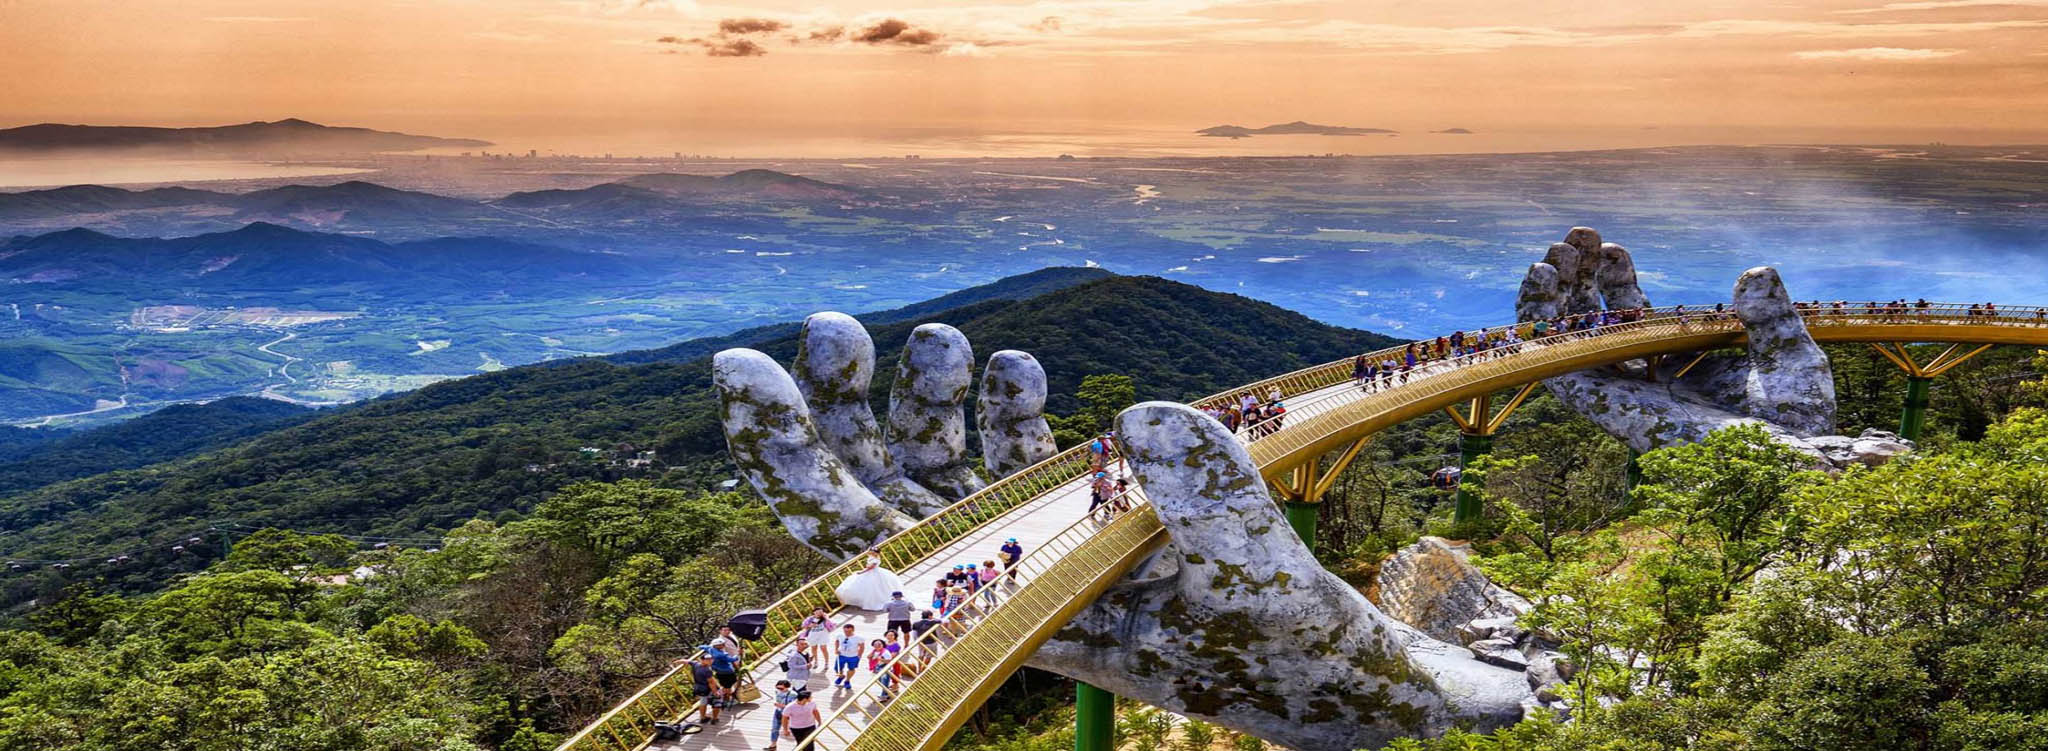 4 Days Da Nang - Golden Bridge - Hoi An Ancient Town Package Tour.